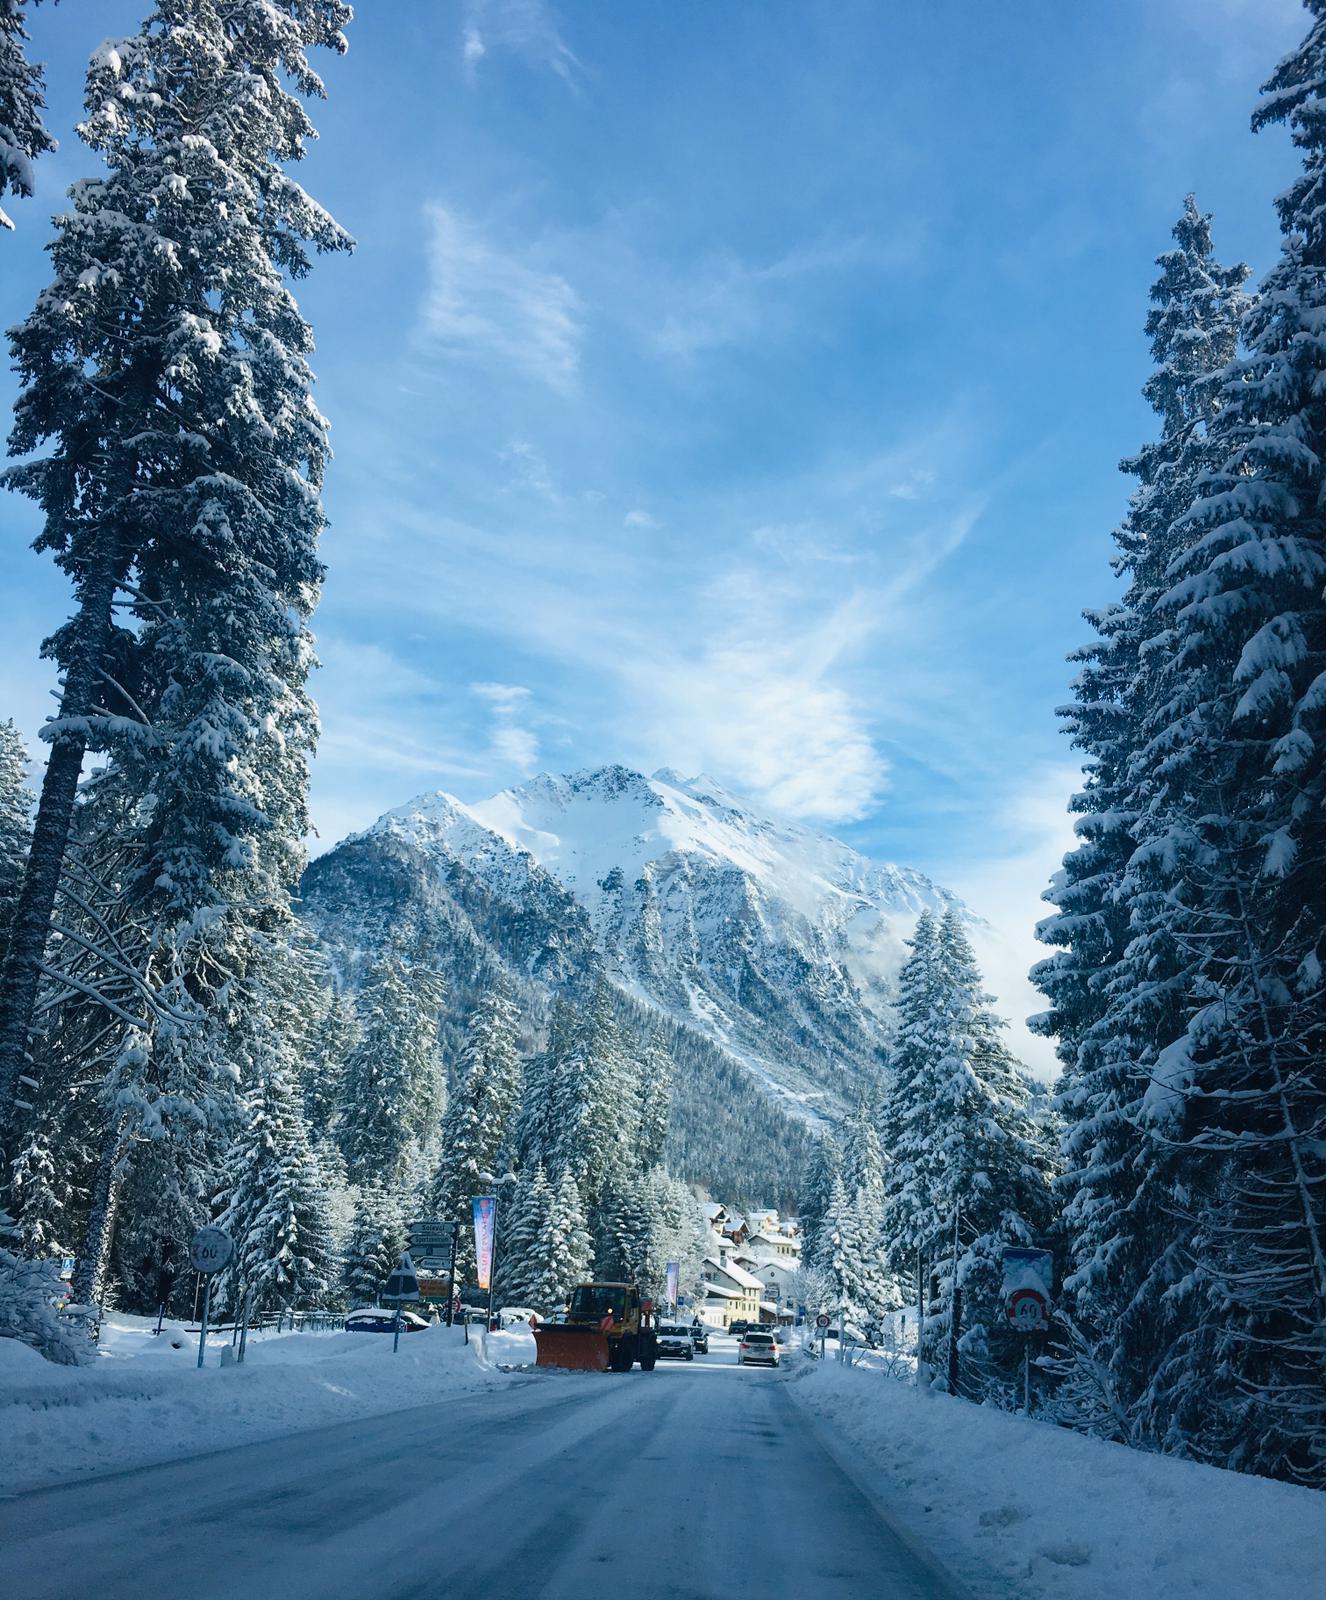 Winter-To-Do-List: Update